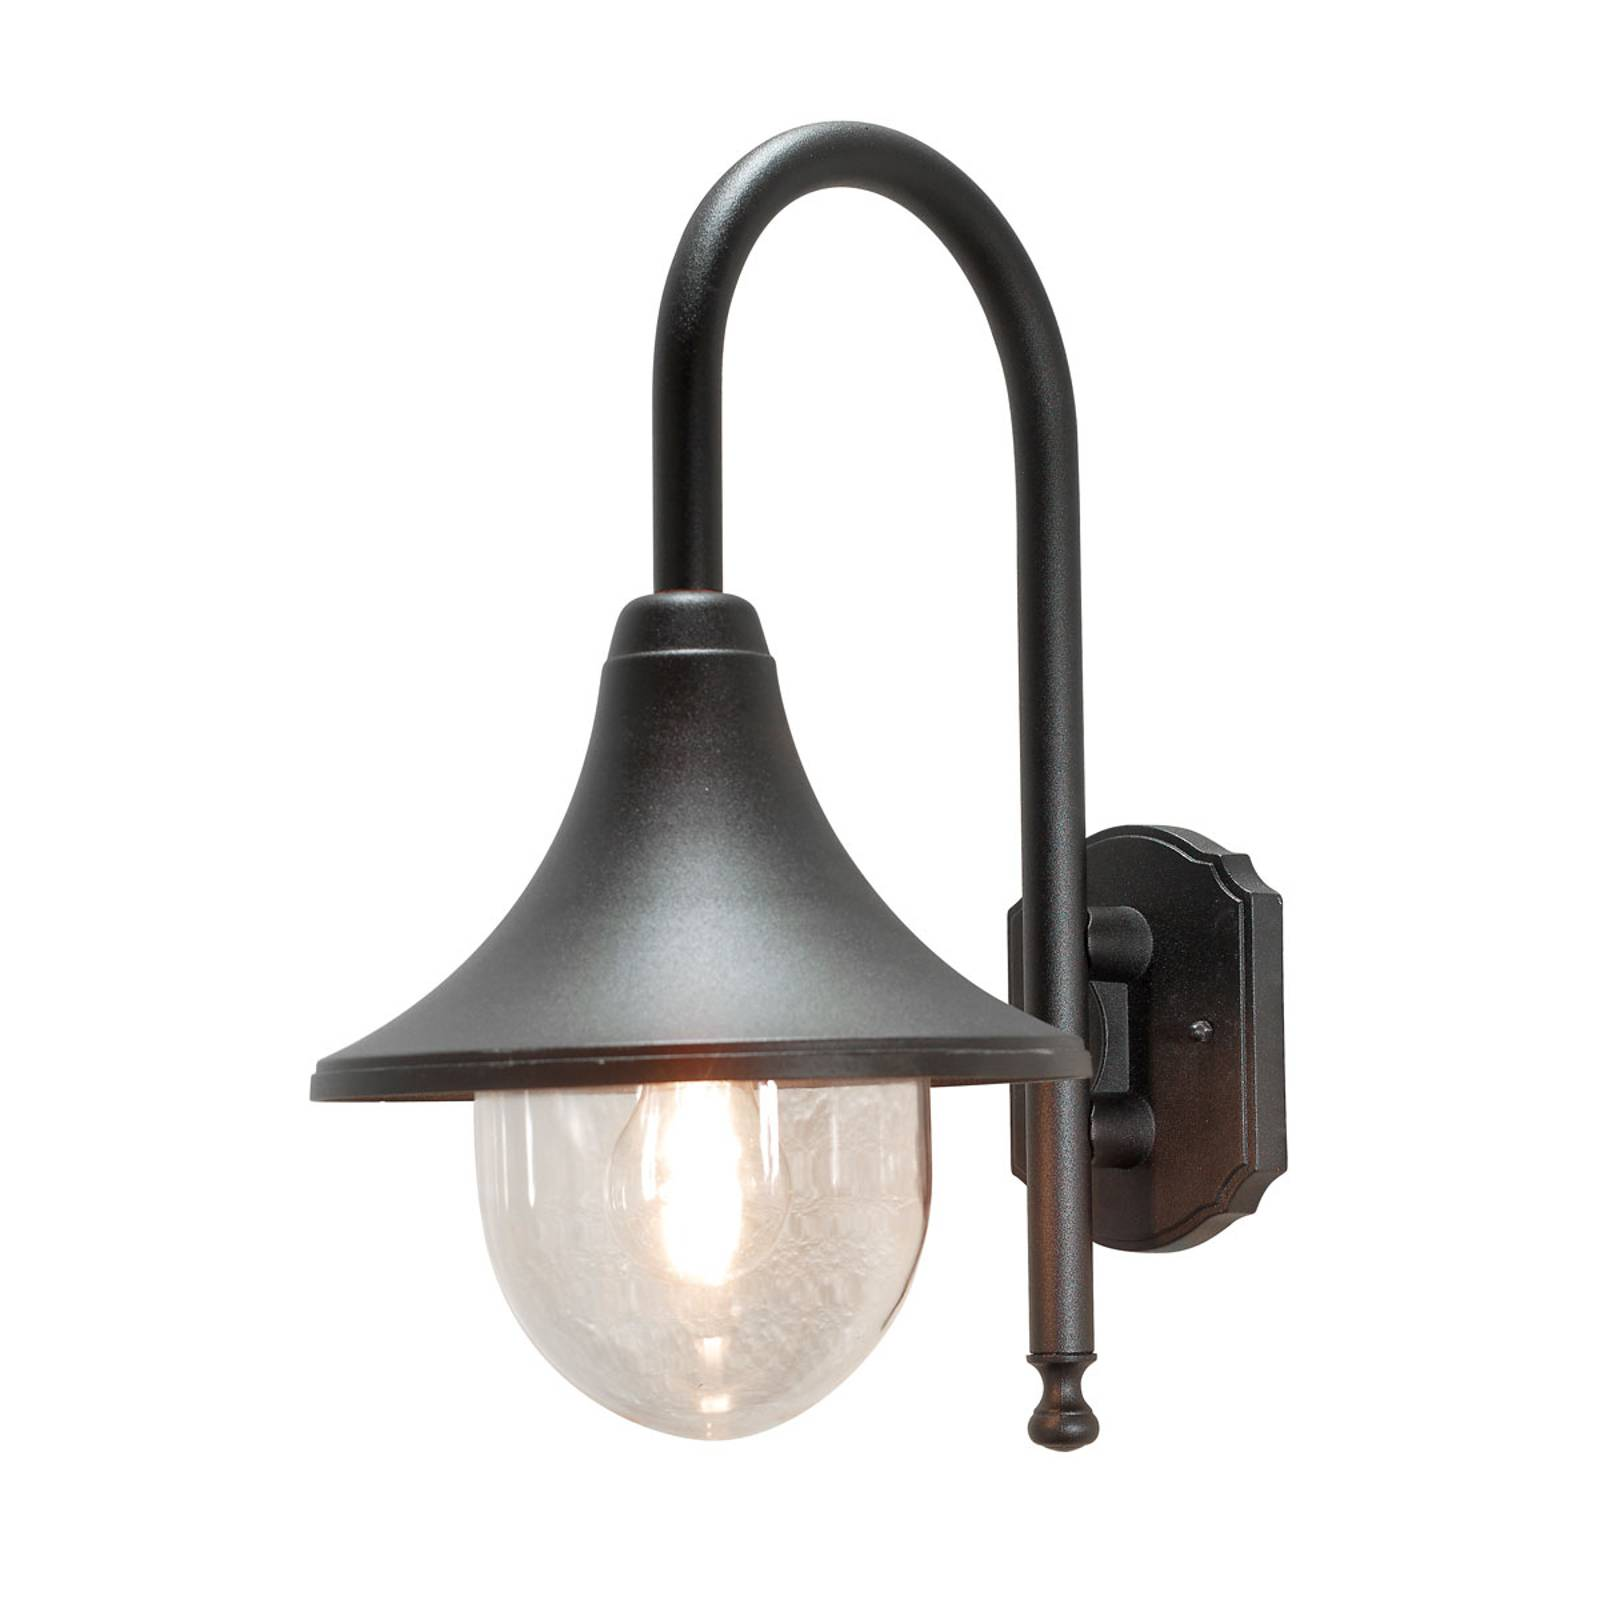 Buitenwandlamp Bari, zwart